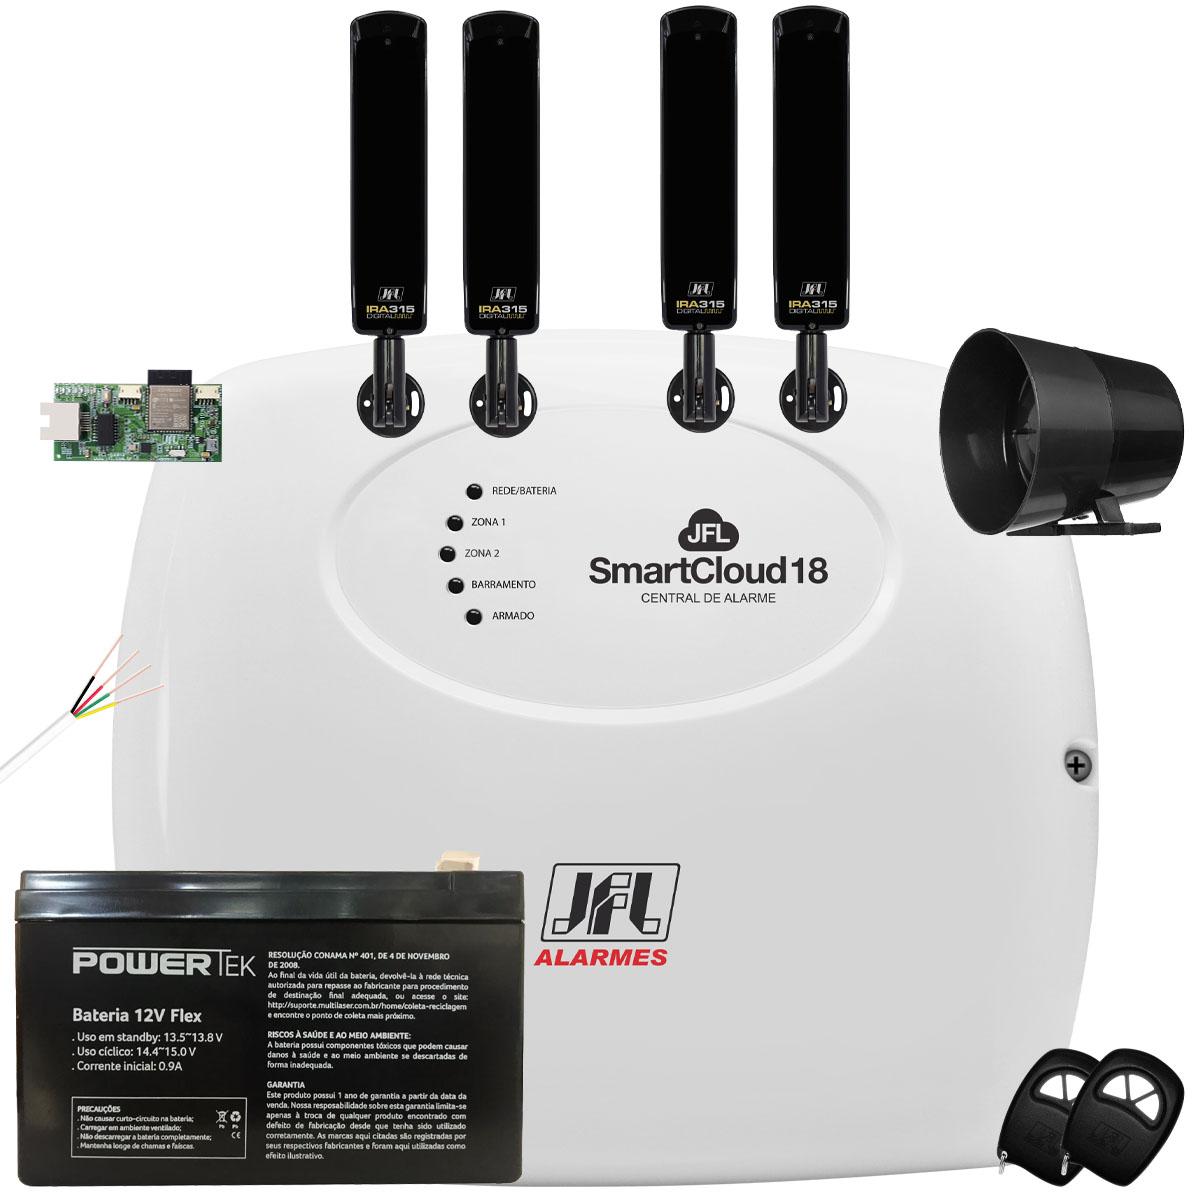 Kit Alarme SmartCloud 18 Jfl Com Sensor Barreira Ira 315